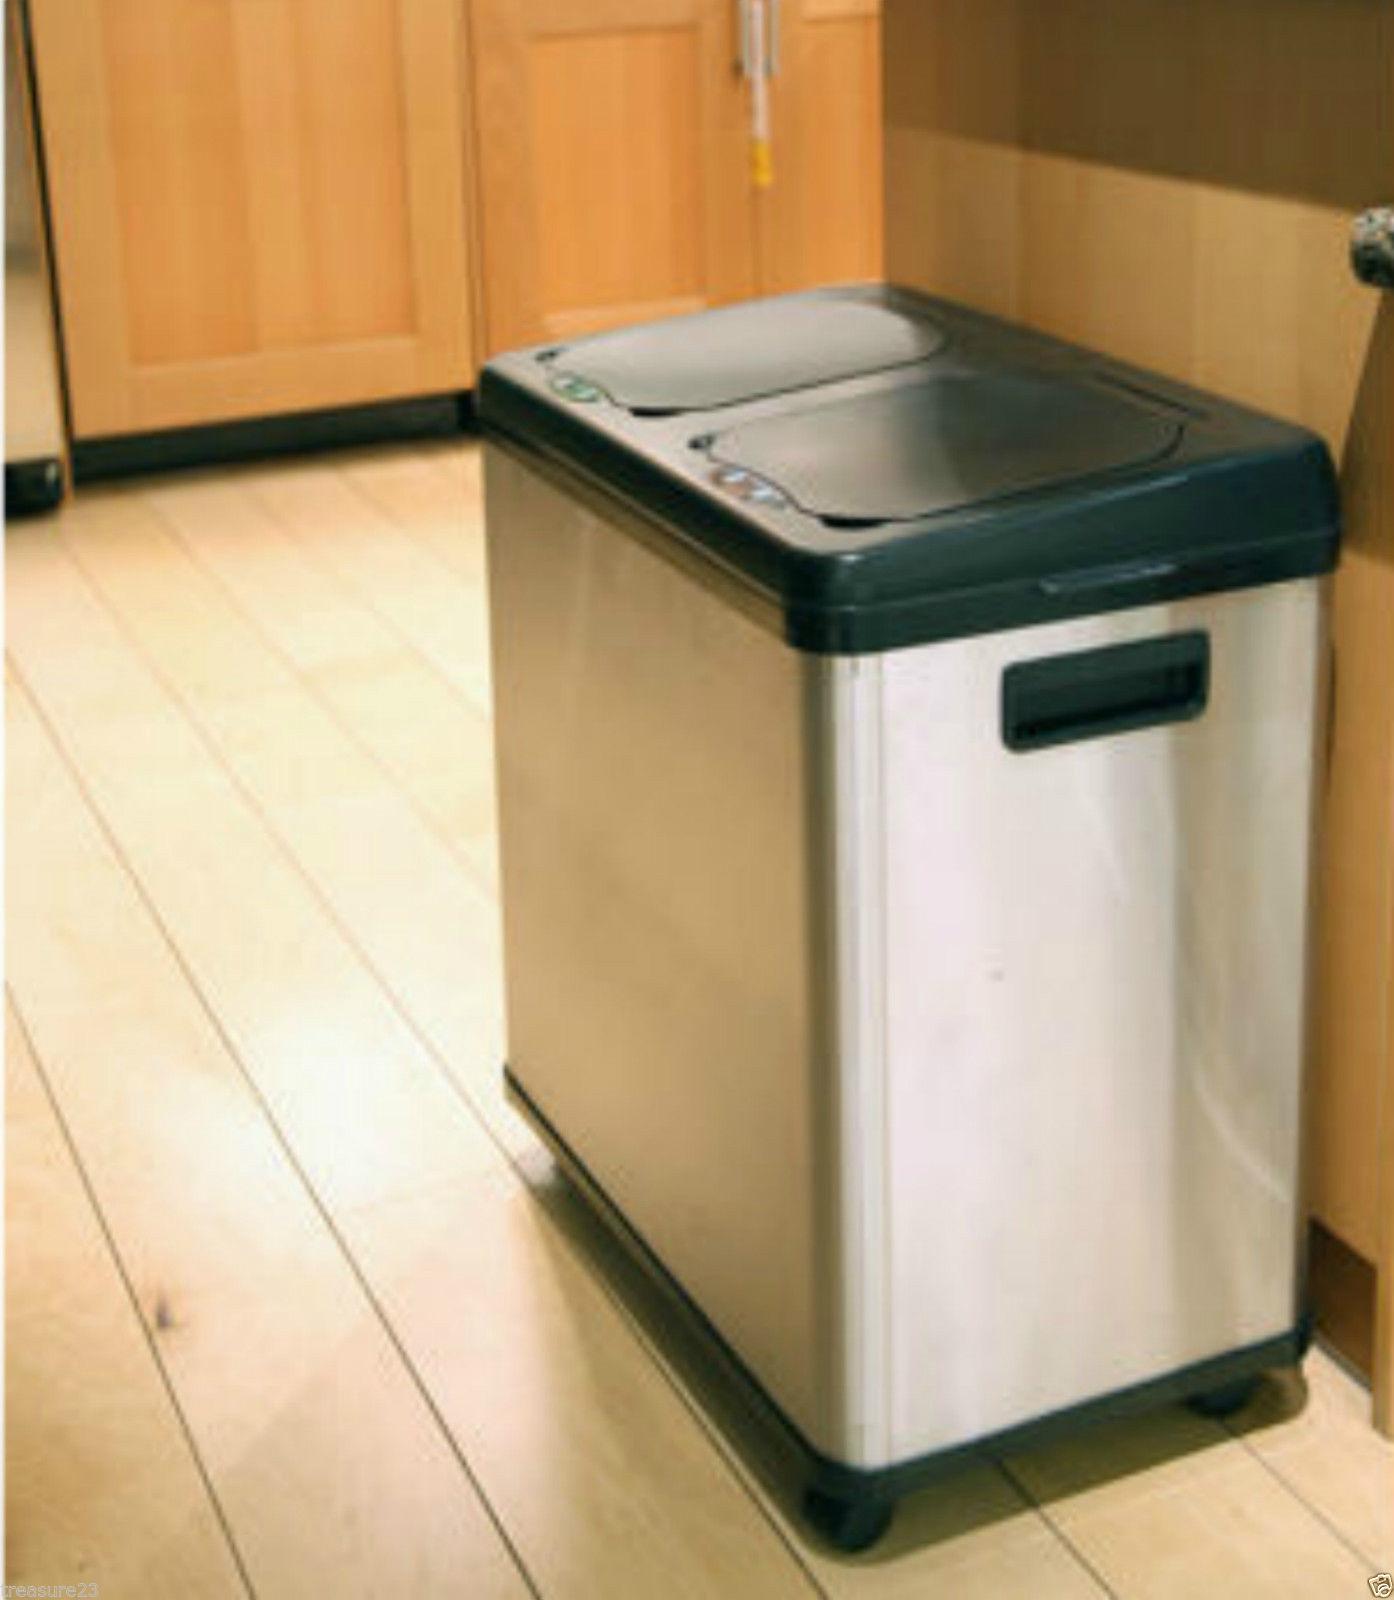 Stainless steel garbage can for kitchen kitchen ideas - Kitchen trash can ideas ...